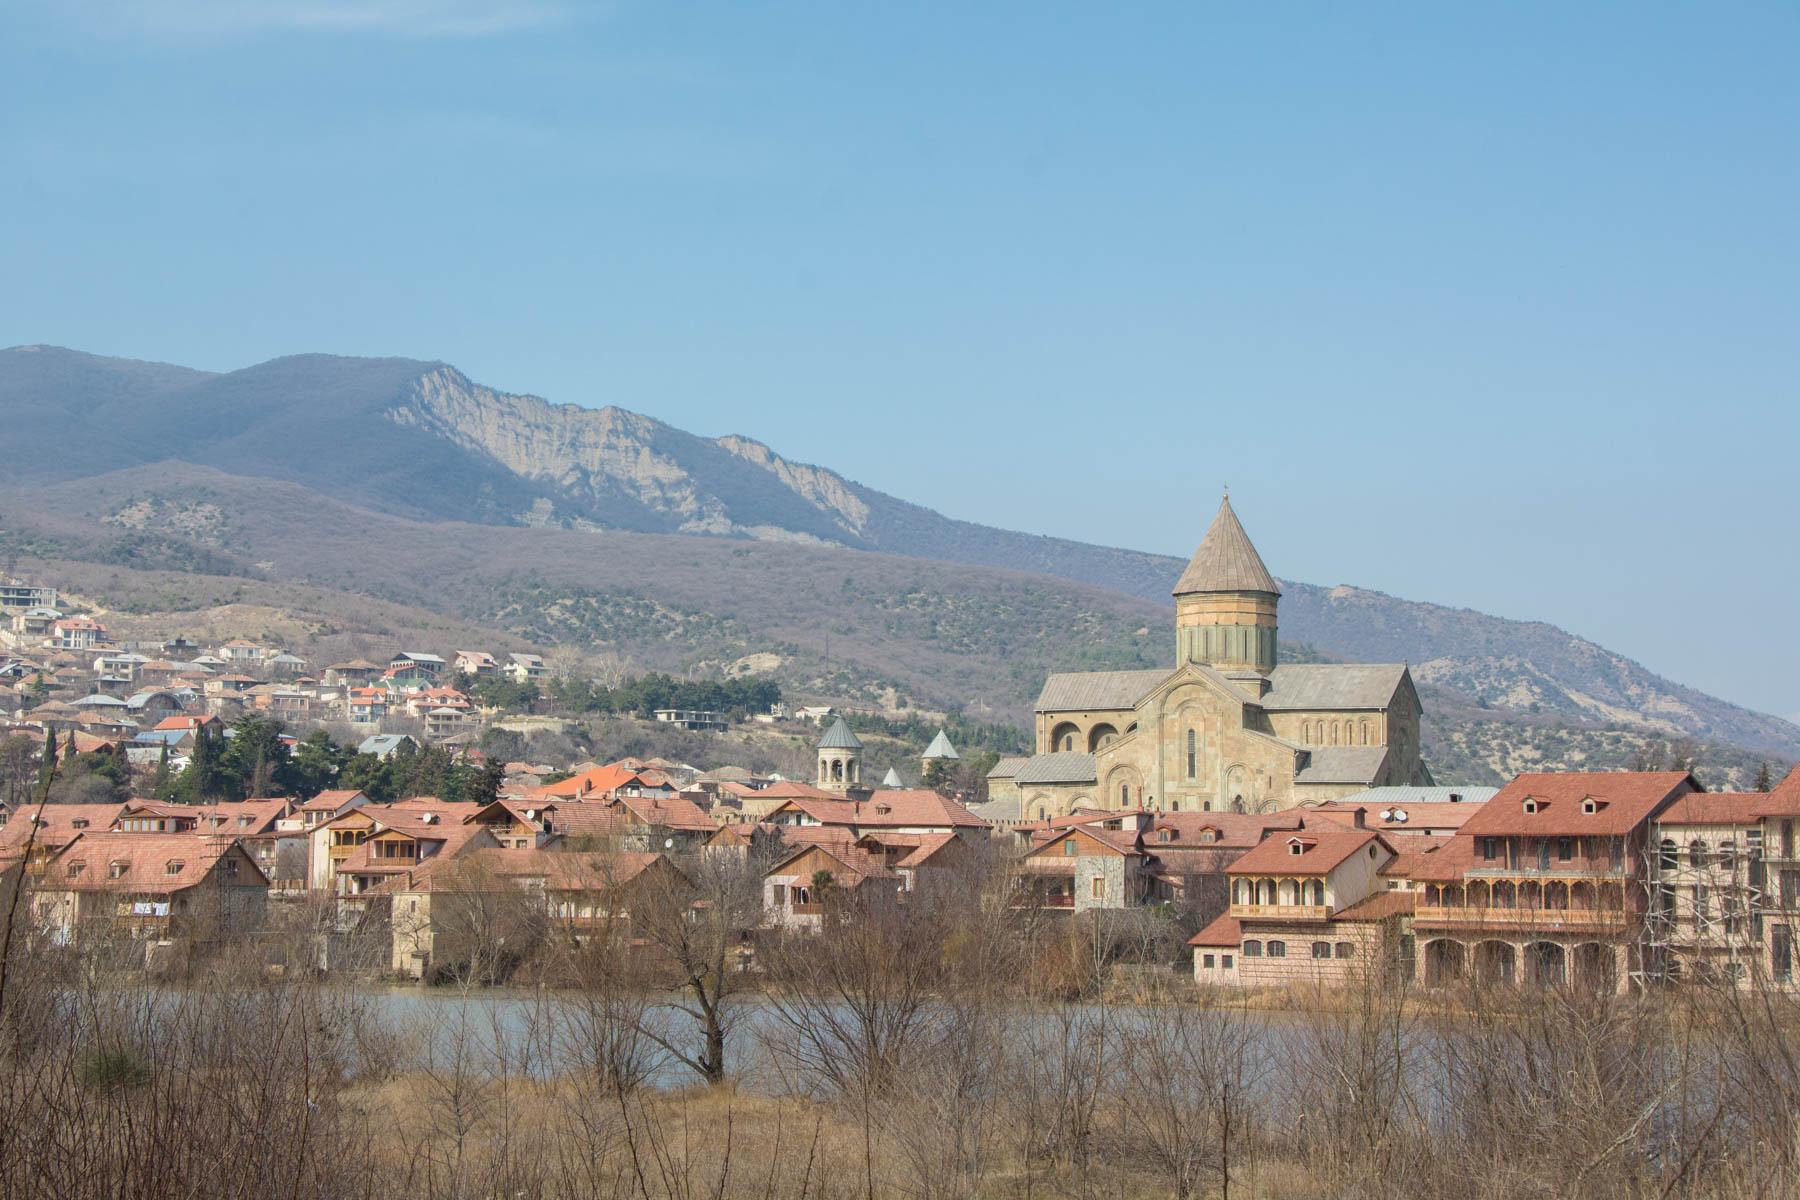 Mtskheta, the birthplace of Christianity in Georgia